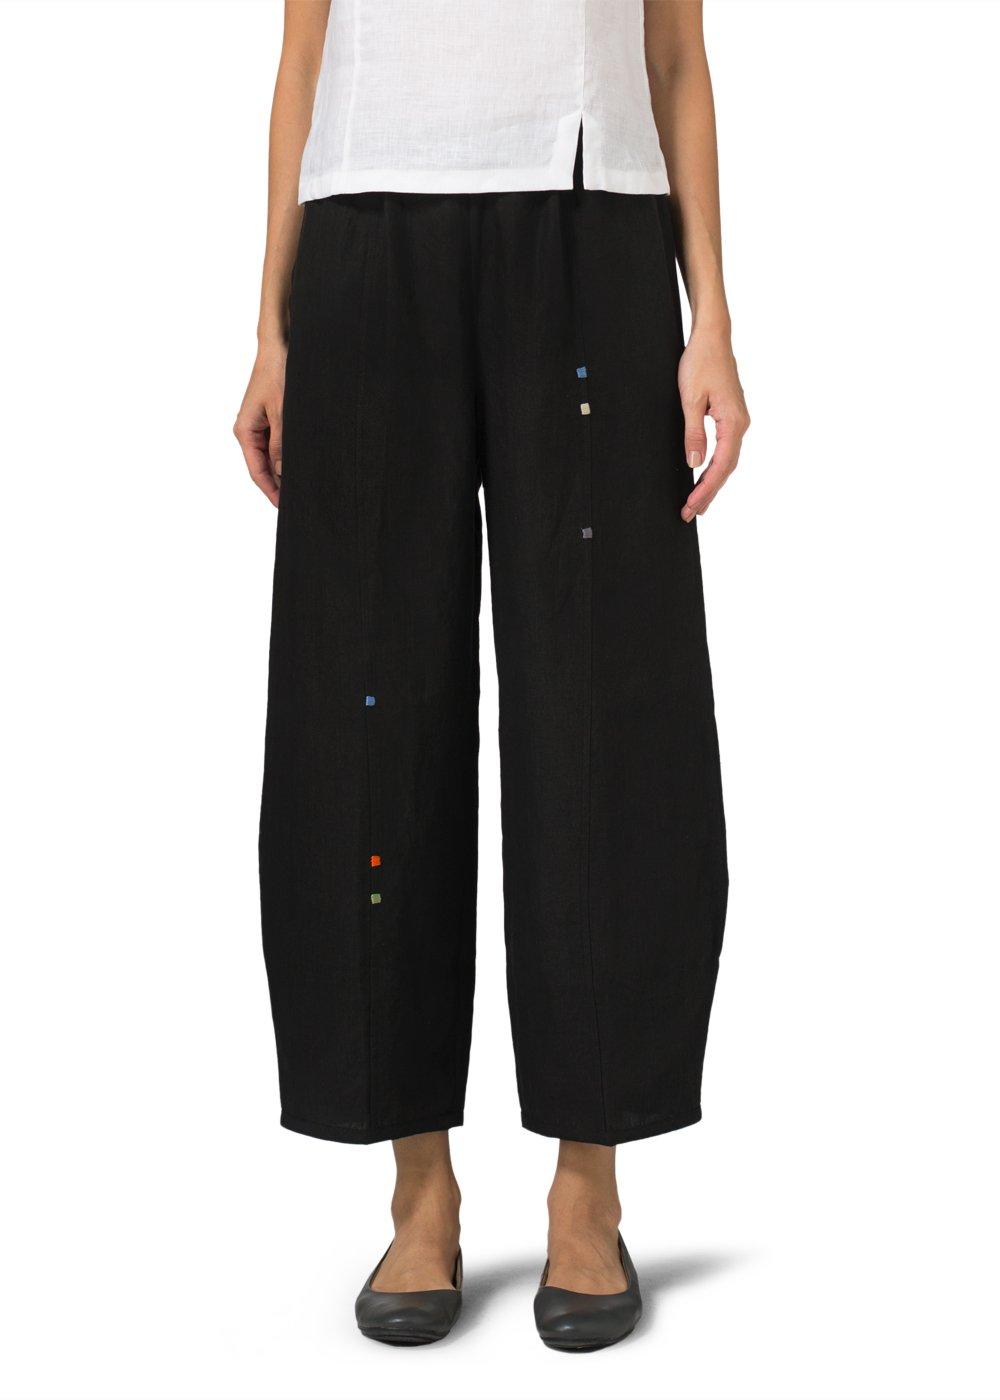 Vivid Linen Embroidered Crop Pants-2X-Black